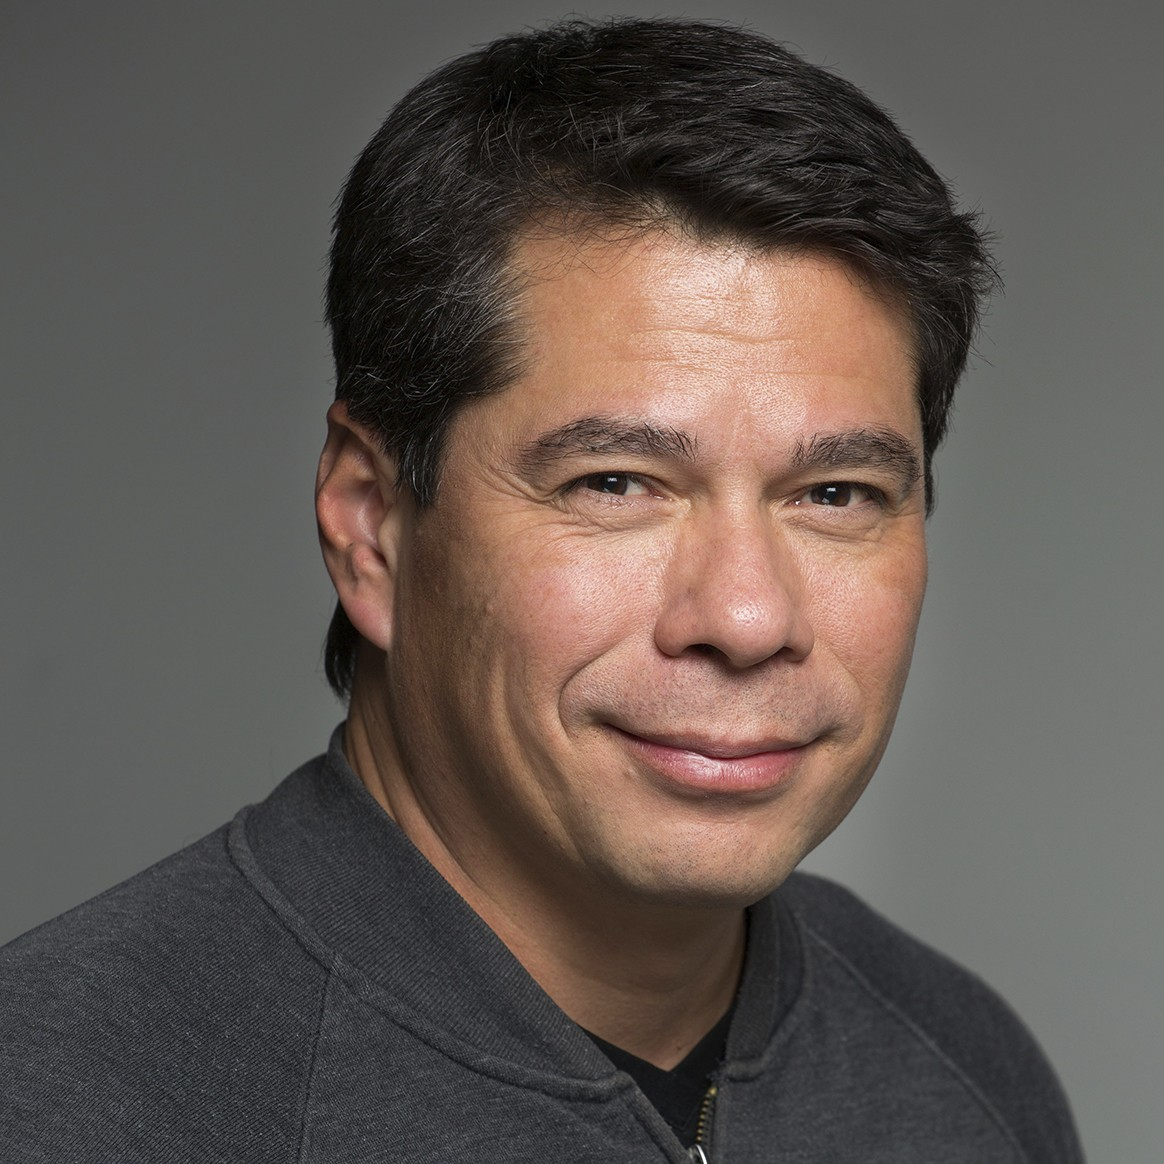 Headshot of Penn State Associate Research Professor of Art Eduardo Navas